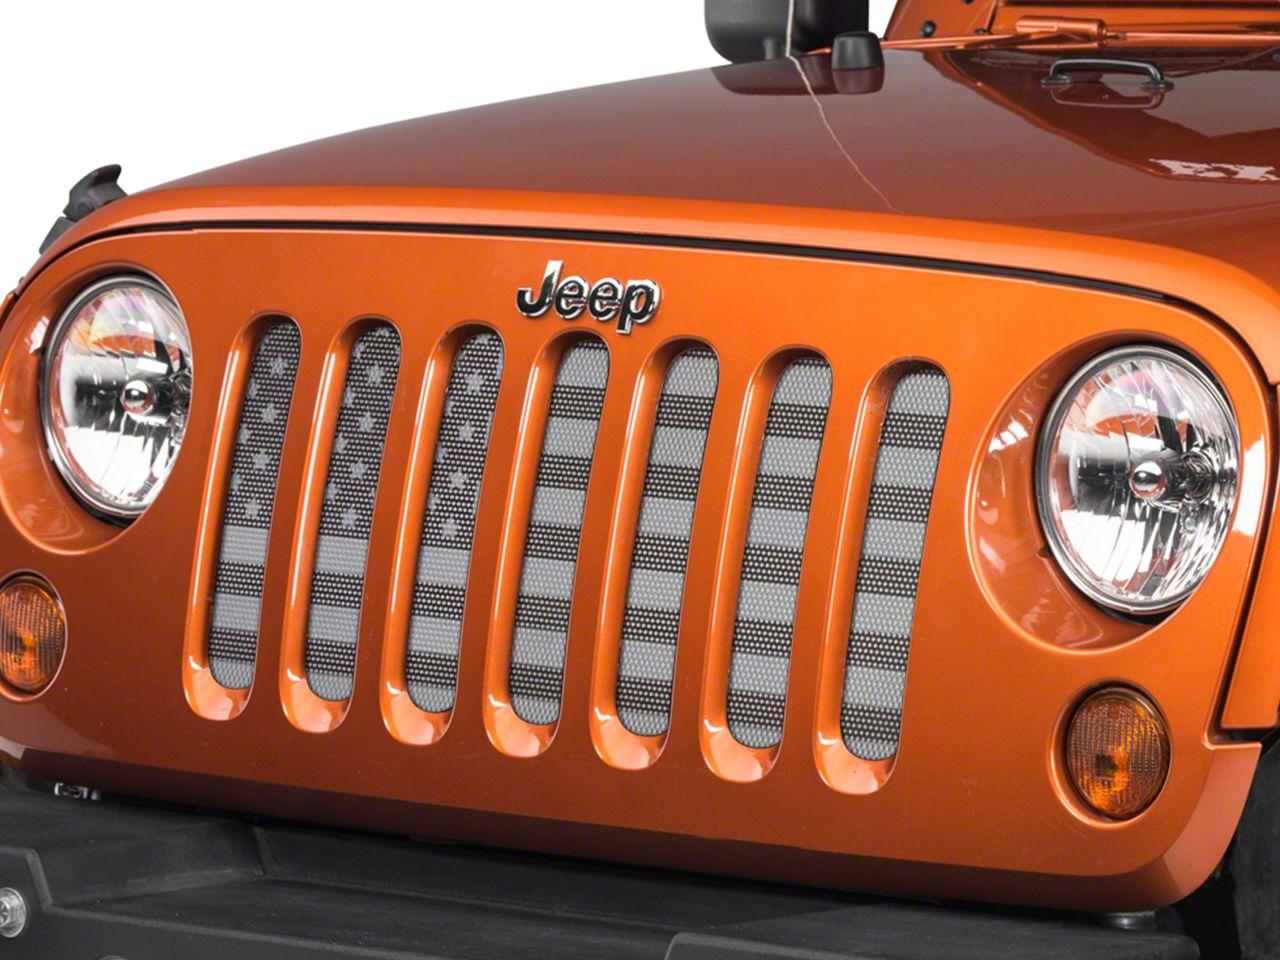 Under the Sun Grille Insert - Black Out (07-18 Jeep Wrangler JK)